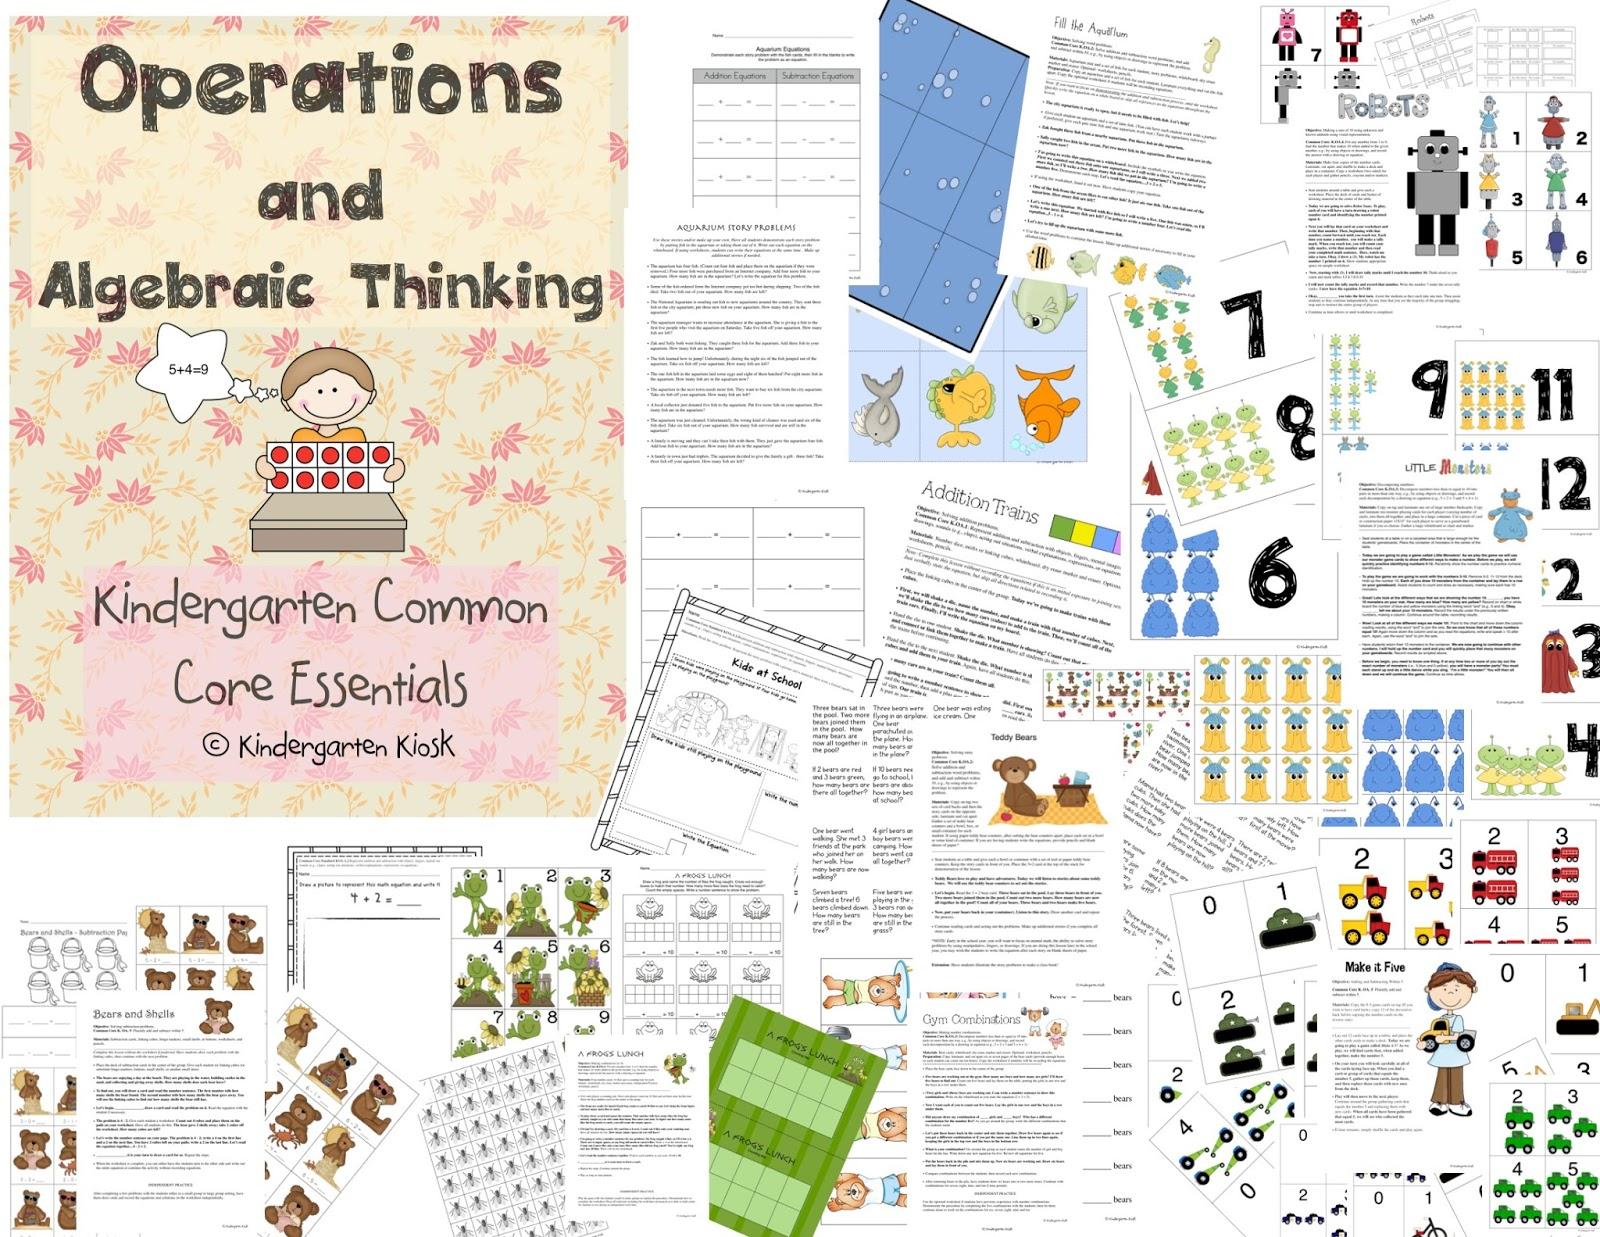 Kindergarten Kiosk Operations Amp Algebraic Thinking